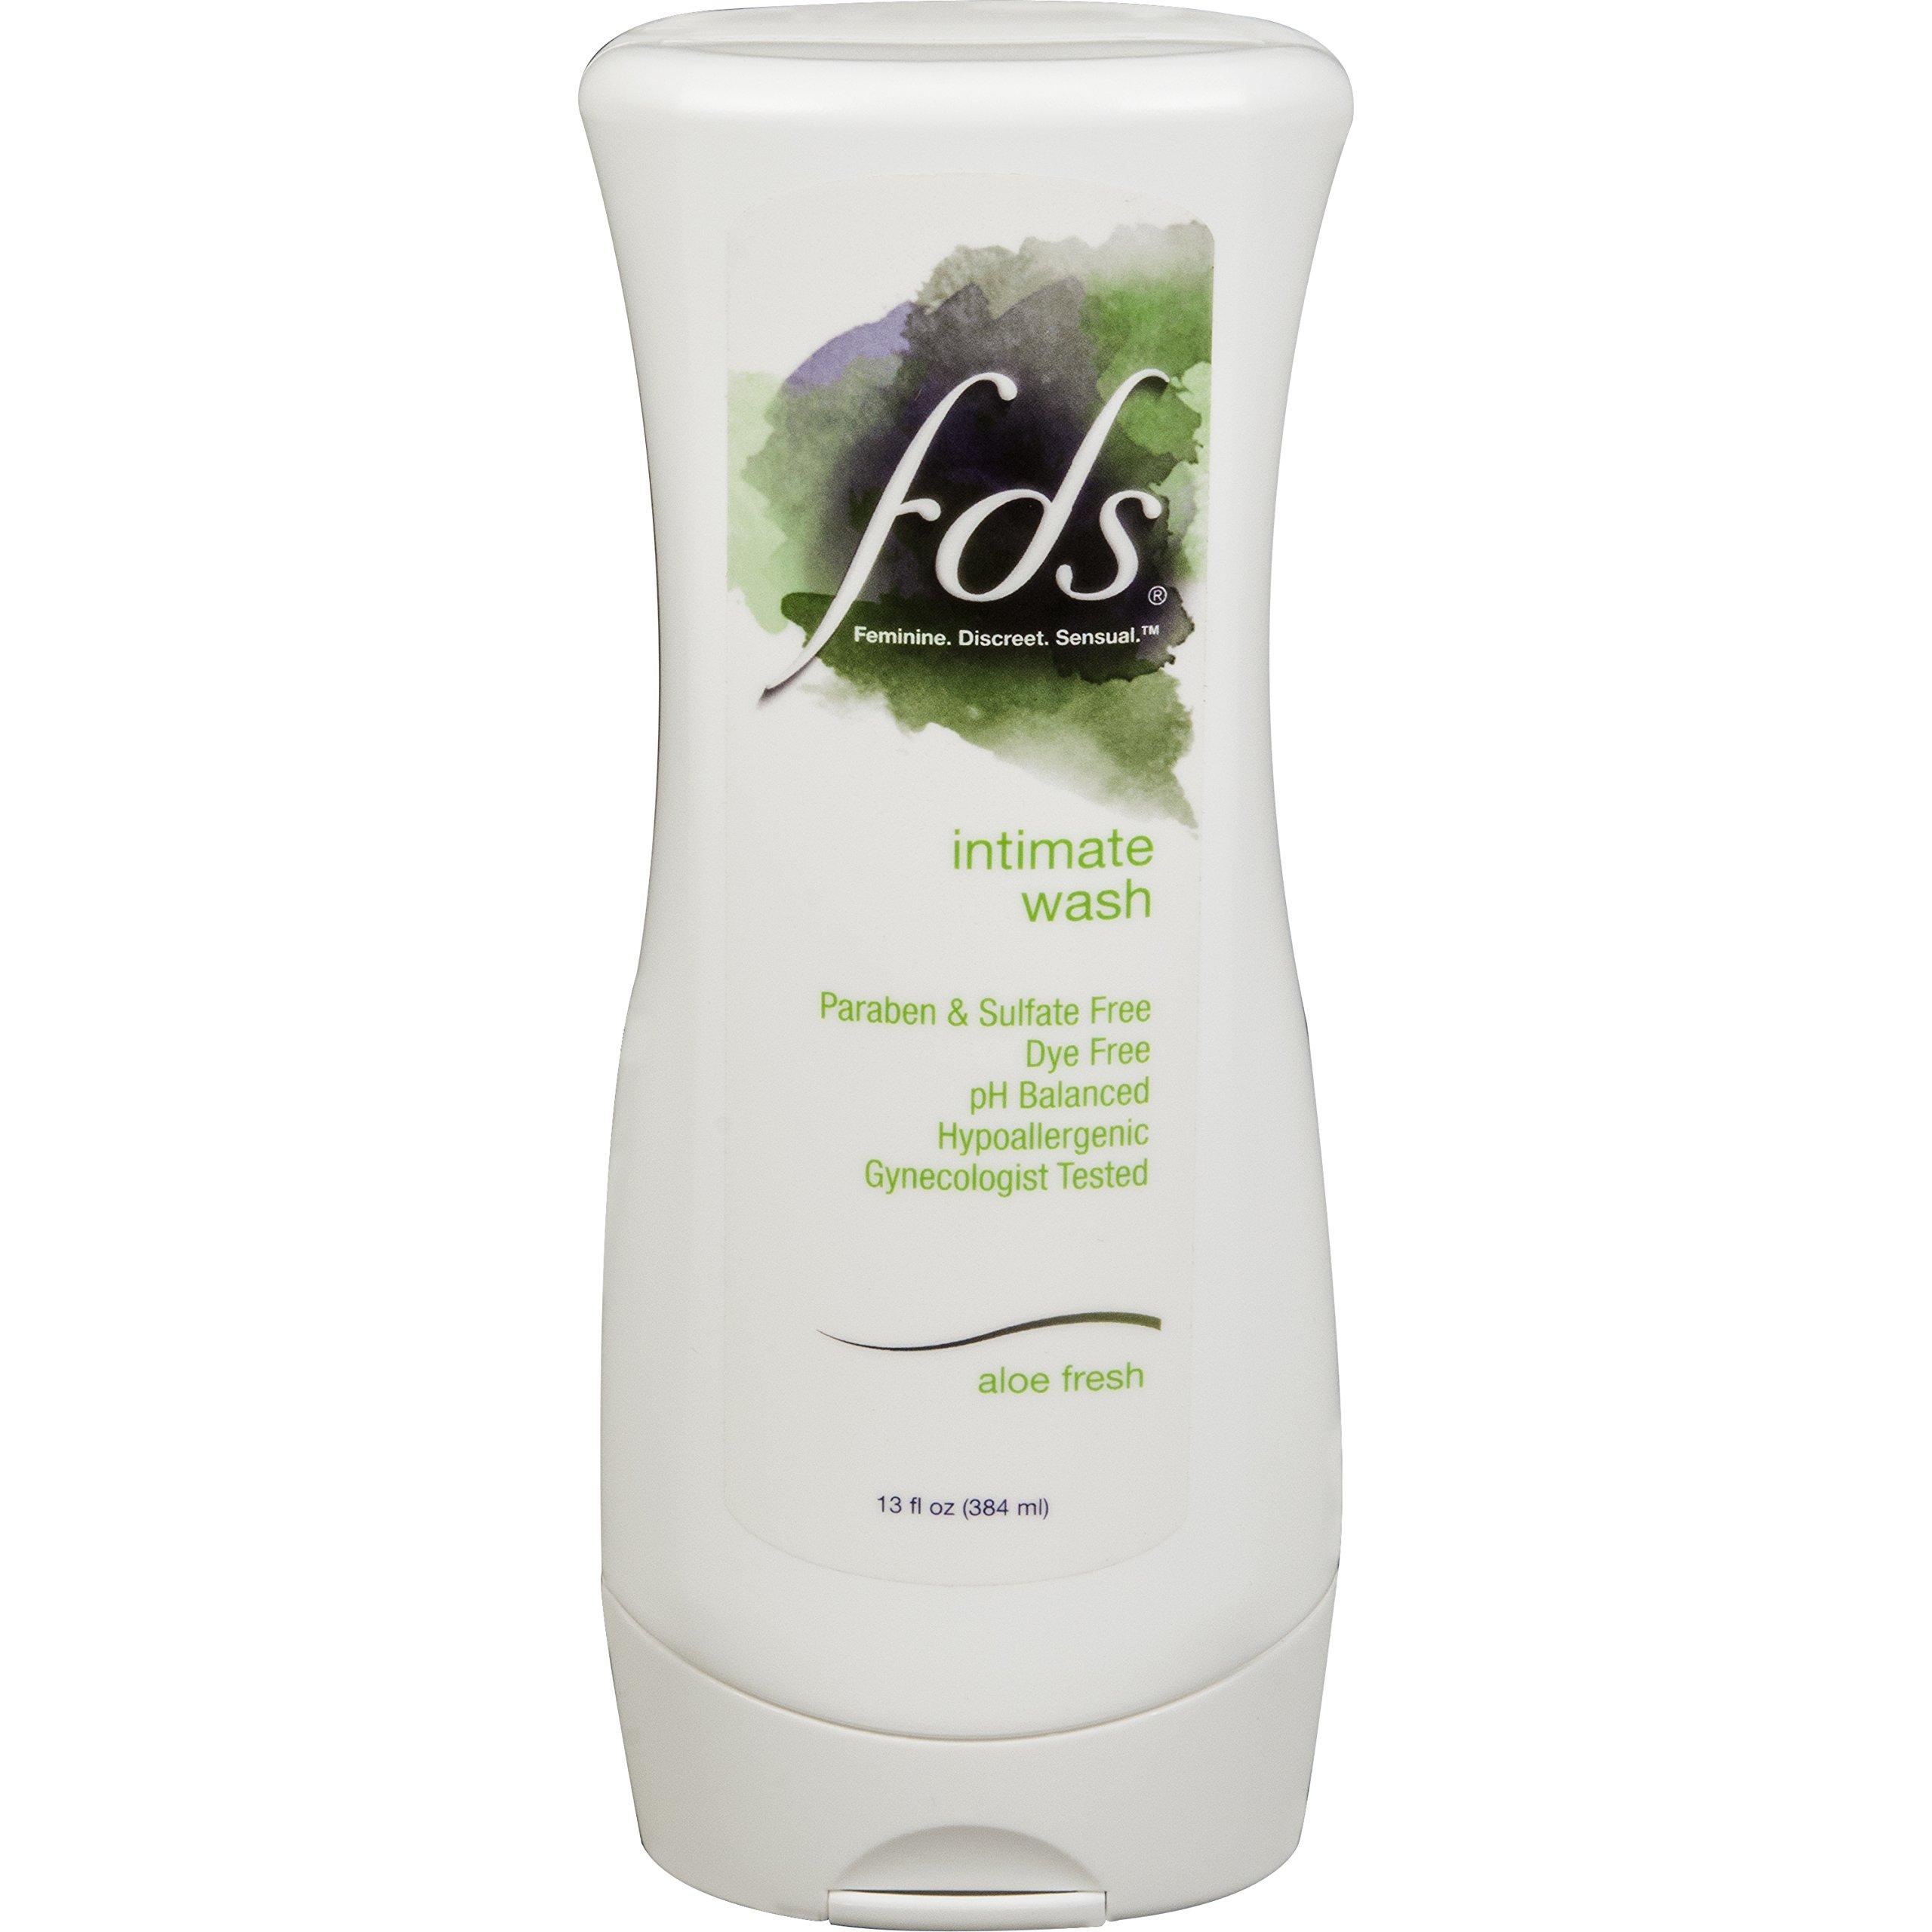 FDS Feminine Hygiene Wash, Aloe Fresh, 13 Ounce Bottle Hypoallergenic pH  Balanced Cleansing Vaginal